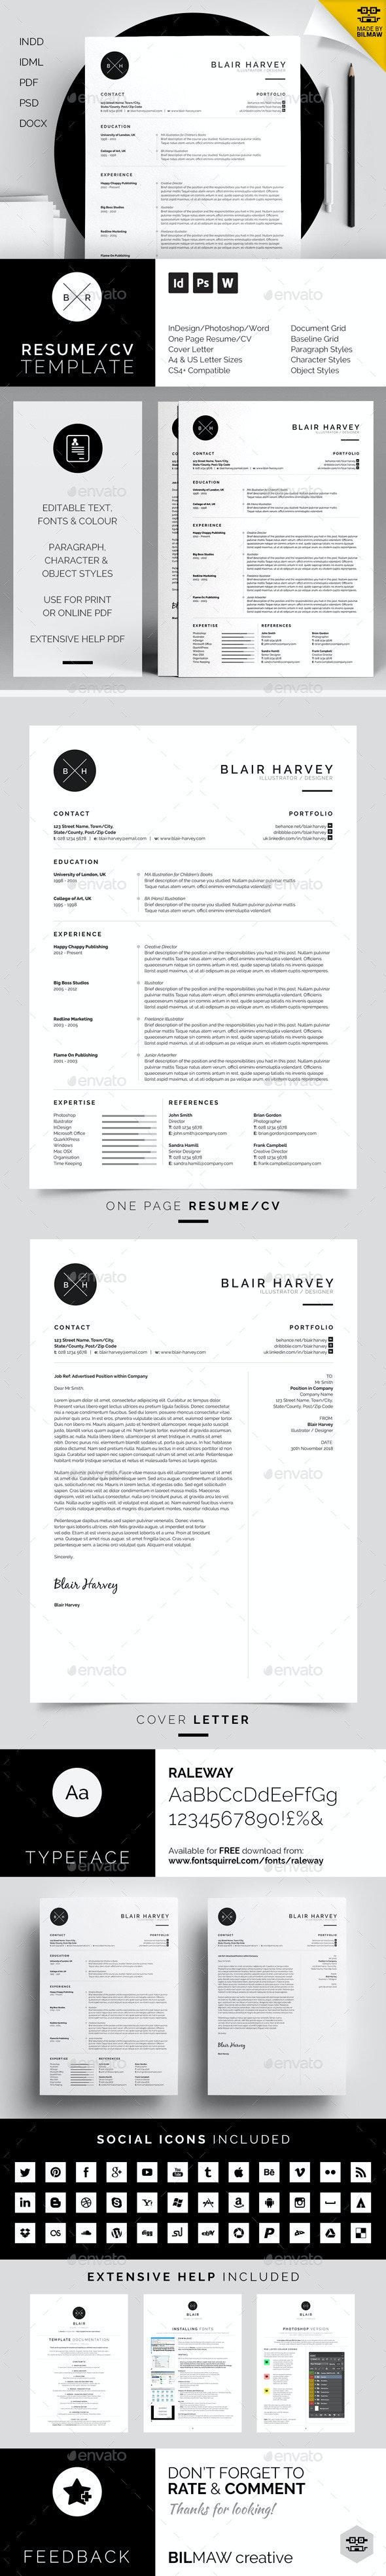 Resume/CV - Blair - Resumes Stationery